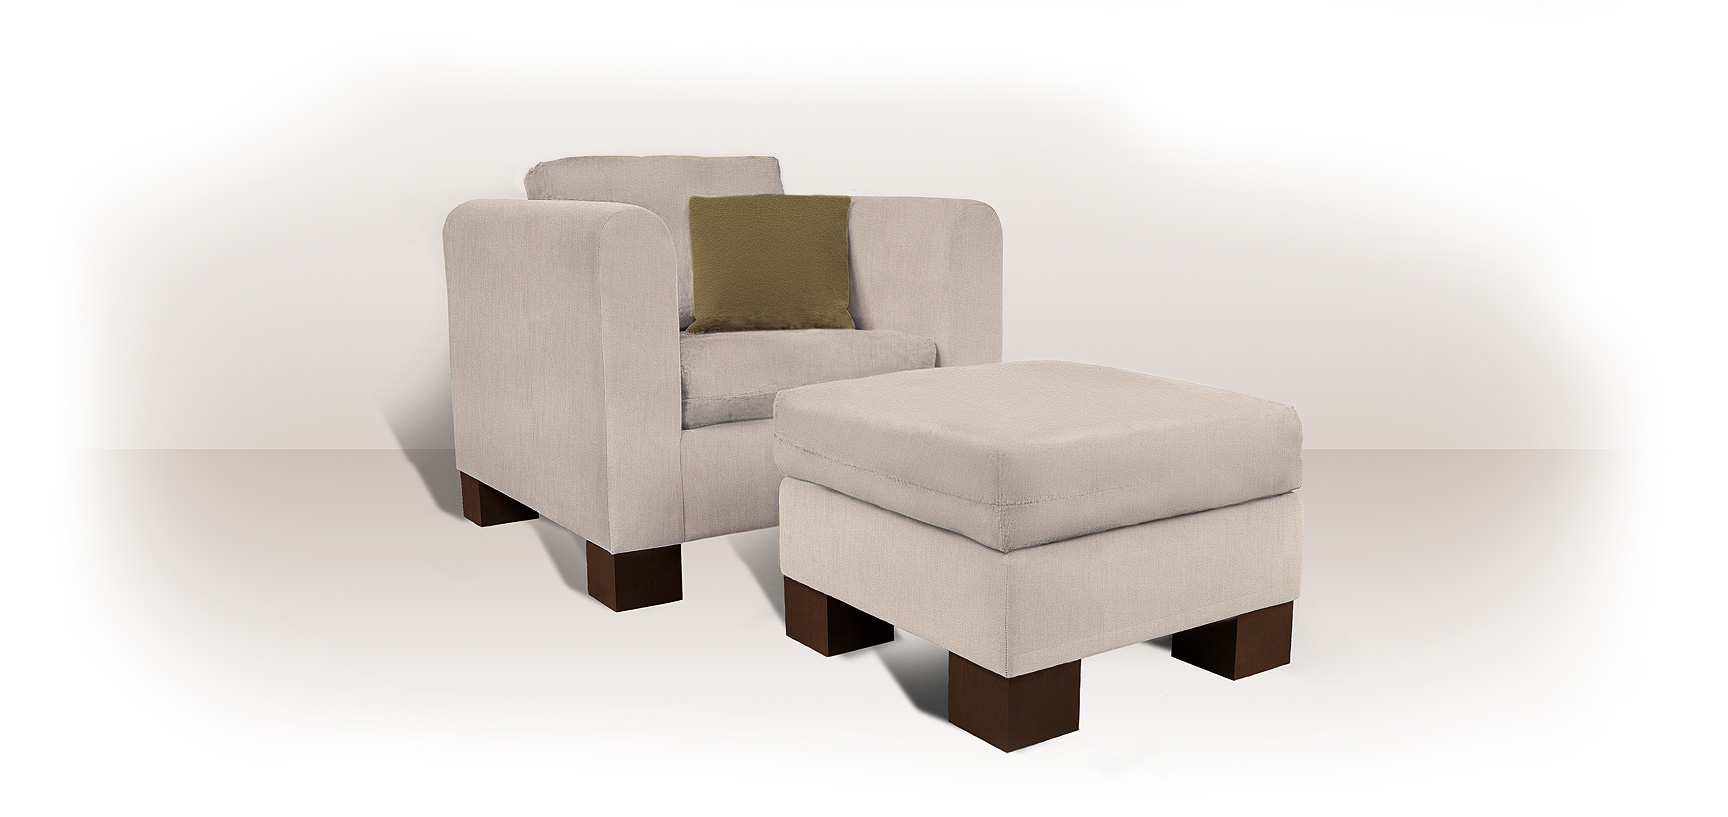 Admirable Suave Collection Sara Jaffe Designs Customarchery Wood Chair Design Ideas Customarcherynet